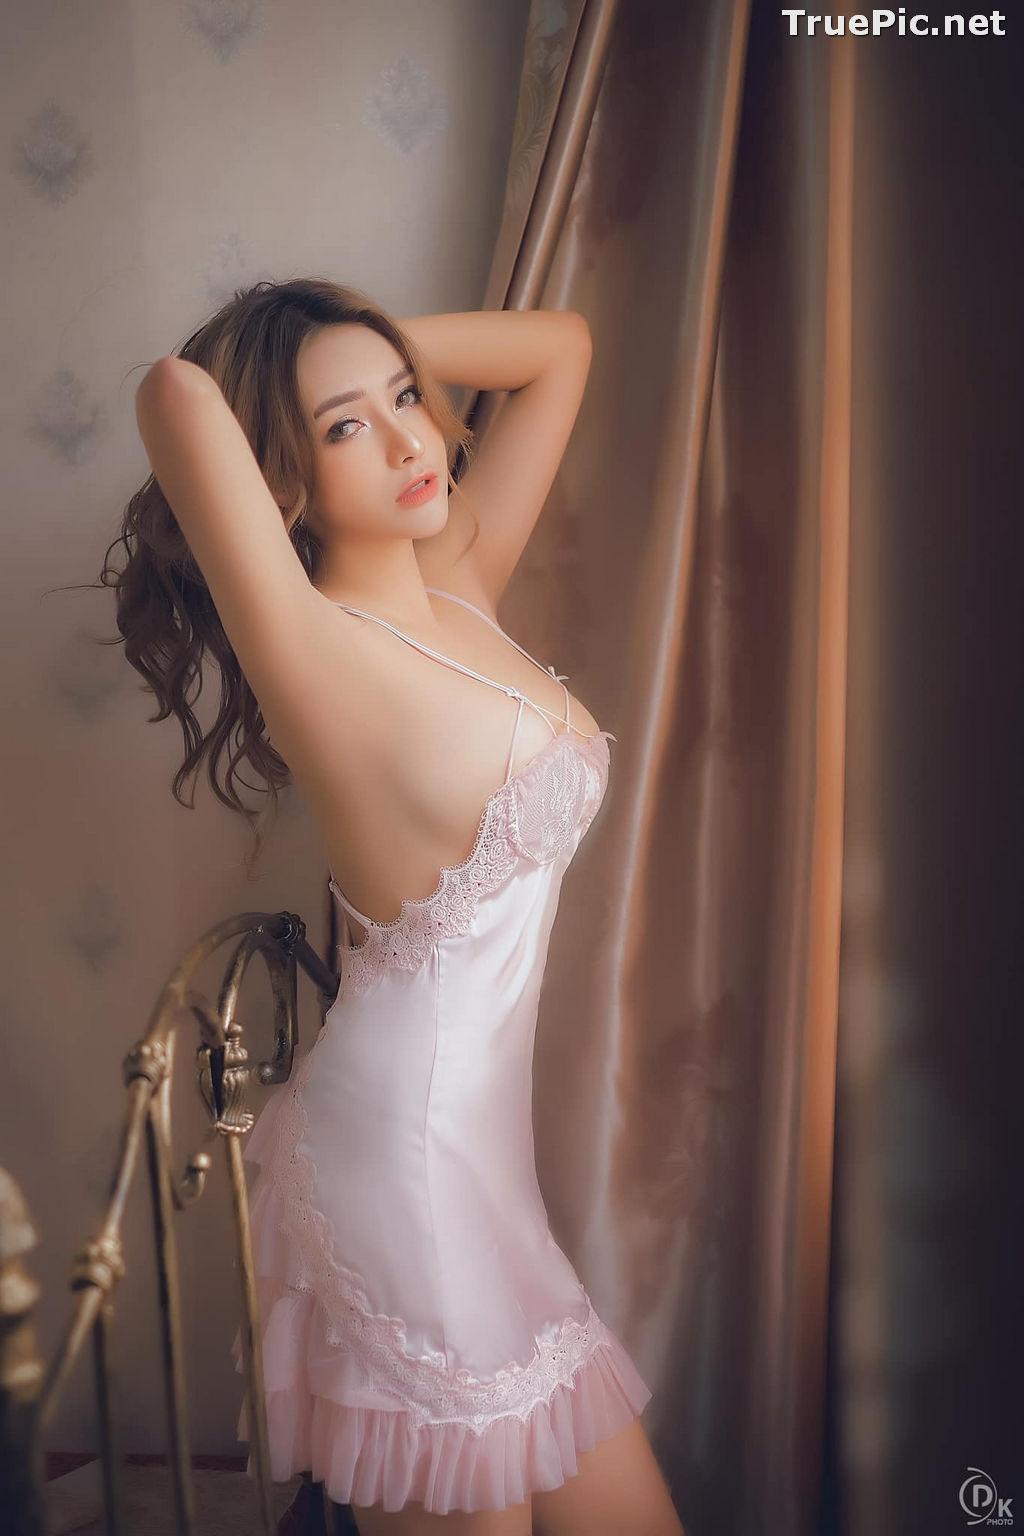 Image Vietnamese Hot Girl - Nguyen Thi Phi Yen - Sexy Beauty Of DJ Girl - TruePic.net - Picture-9